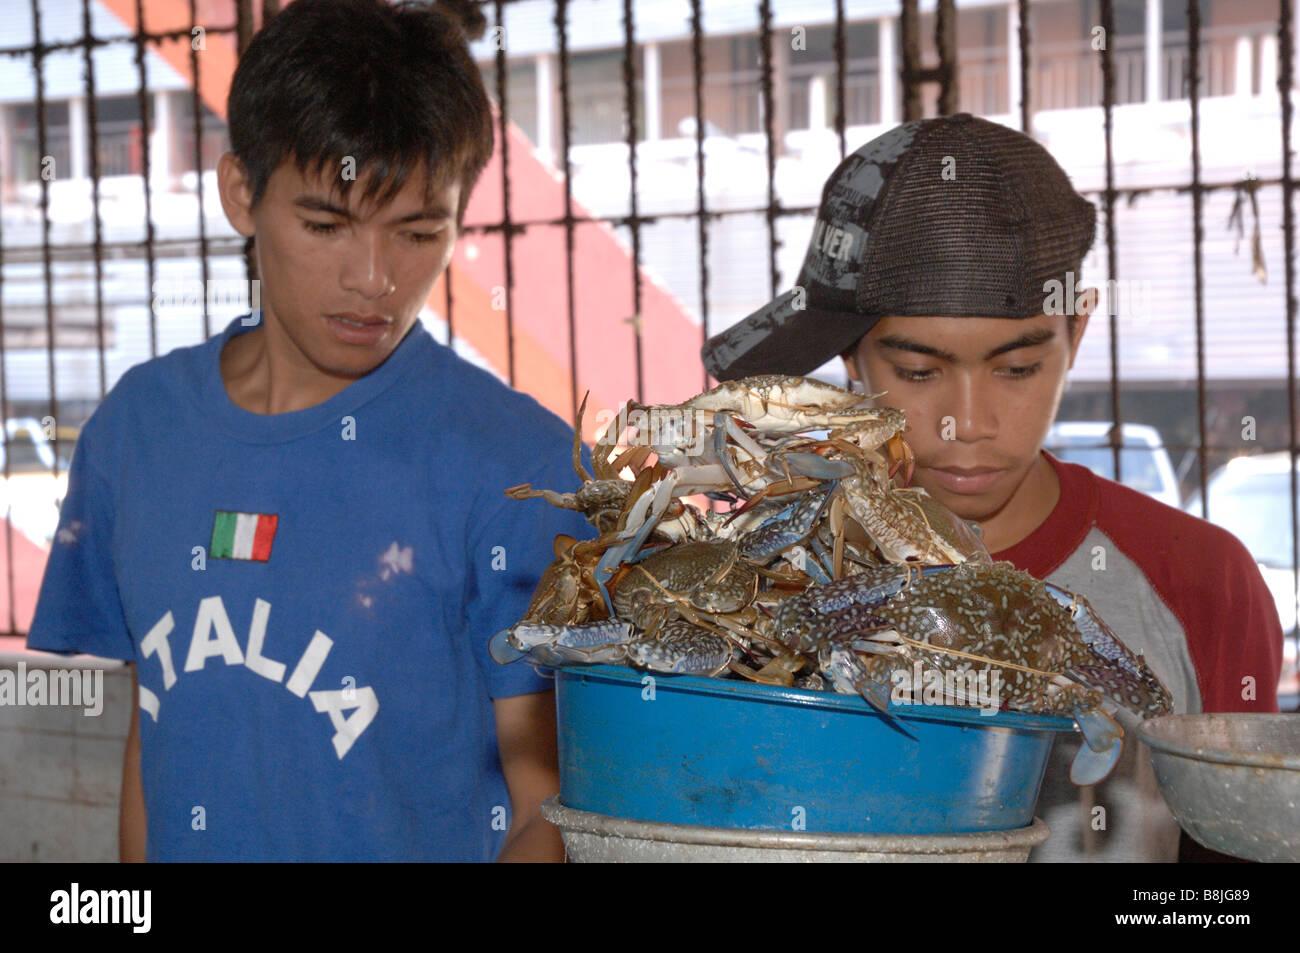 Two boys weighing a bowl of crabs interior of SAFMA fish market Kota Kinabalu Sabah Malyasia Borneo South east Asia - Stock Image